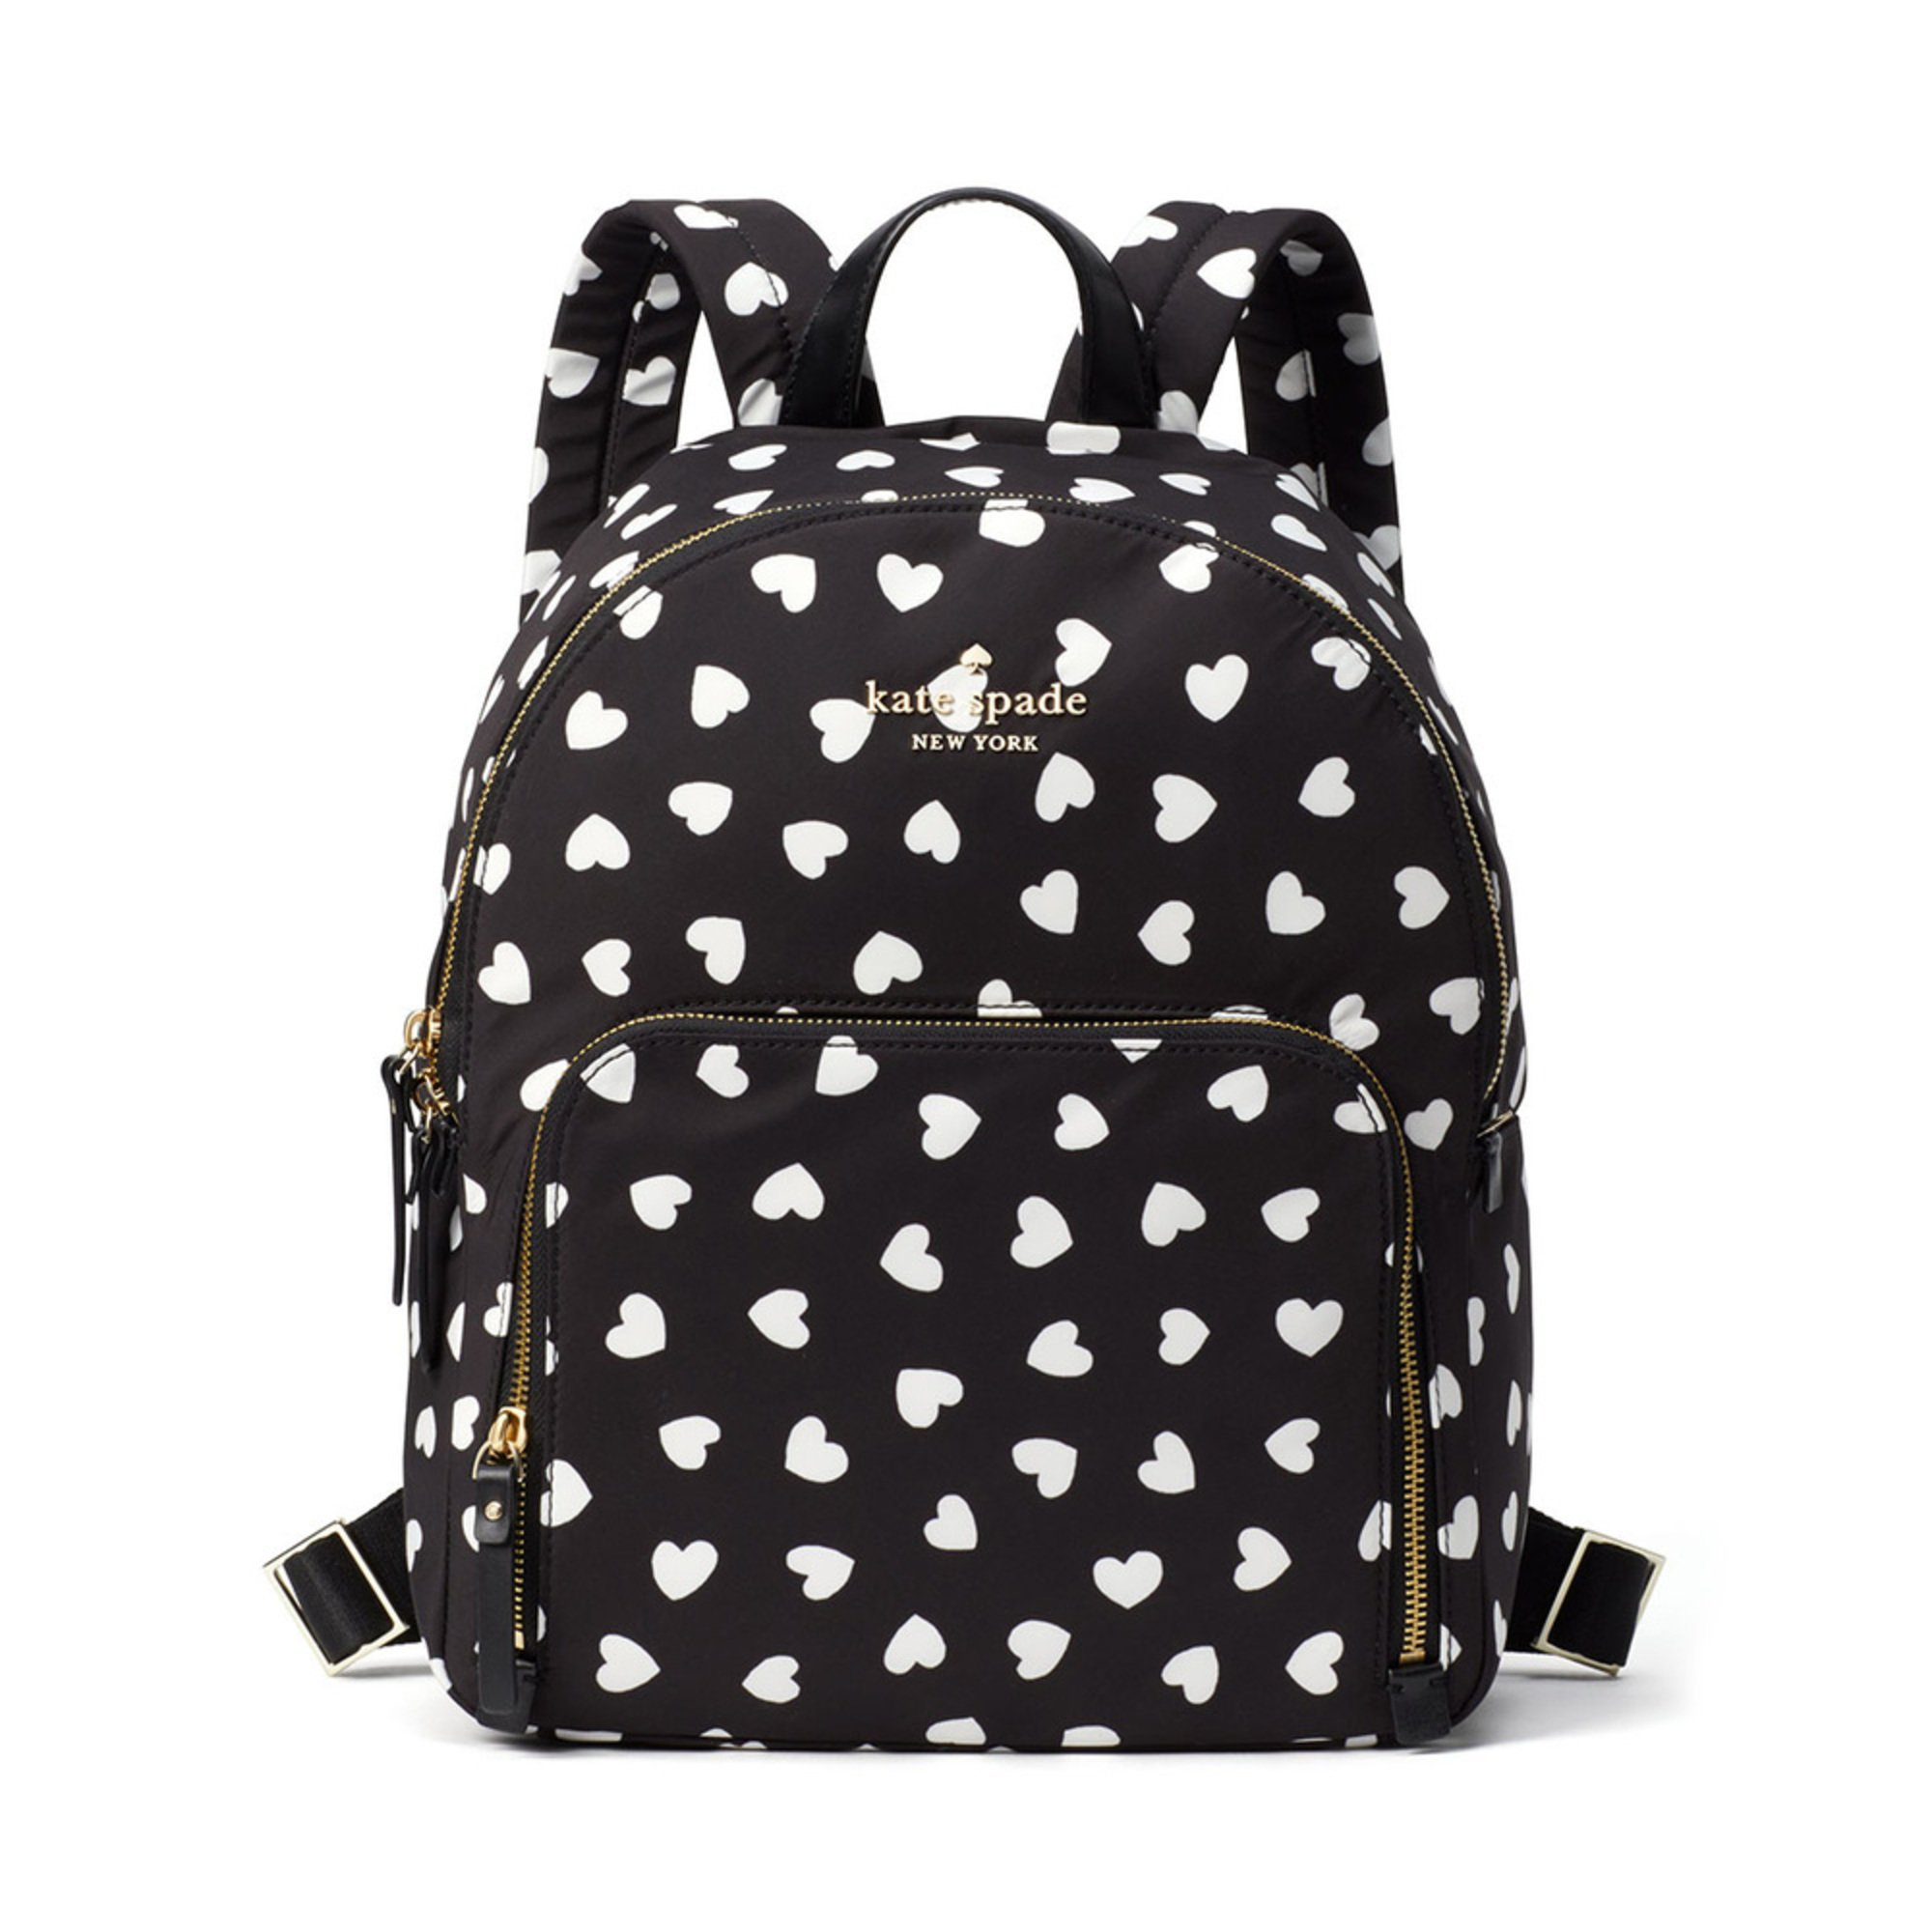 Three Tampa Prep Students Present To American Society Of: Kate Spade Watson Hearts Hartley Backpack Black/cream